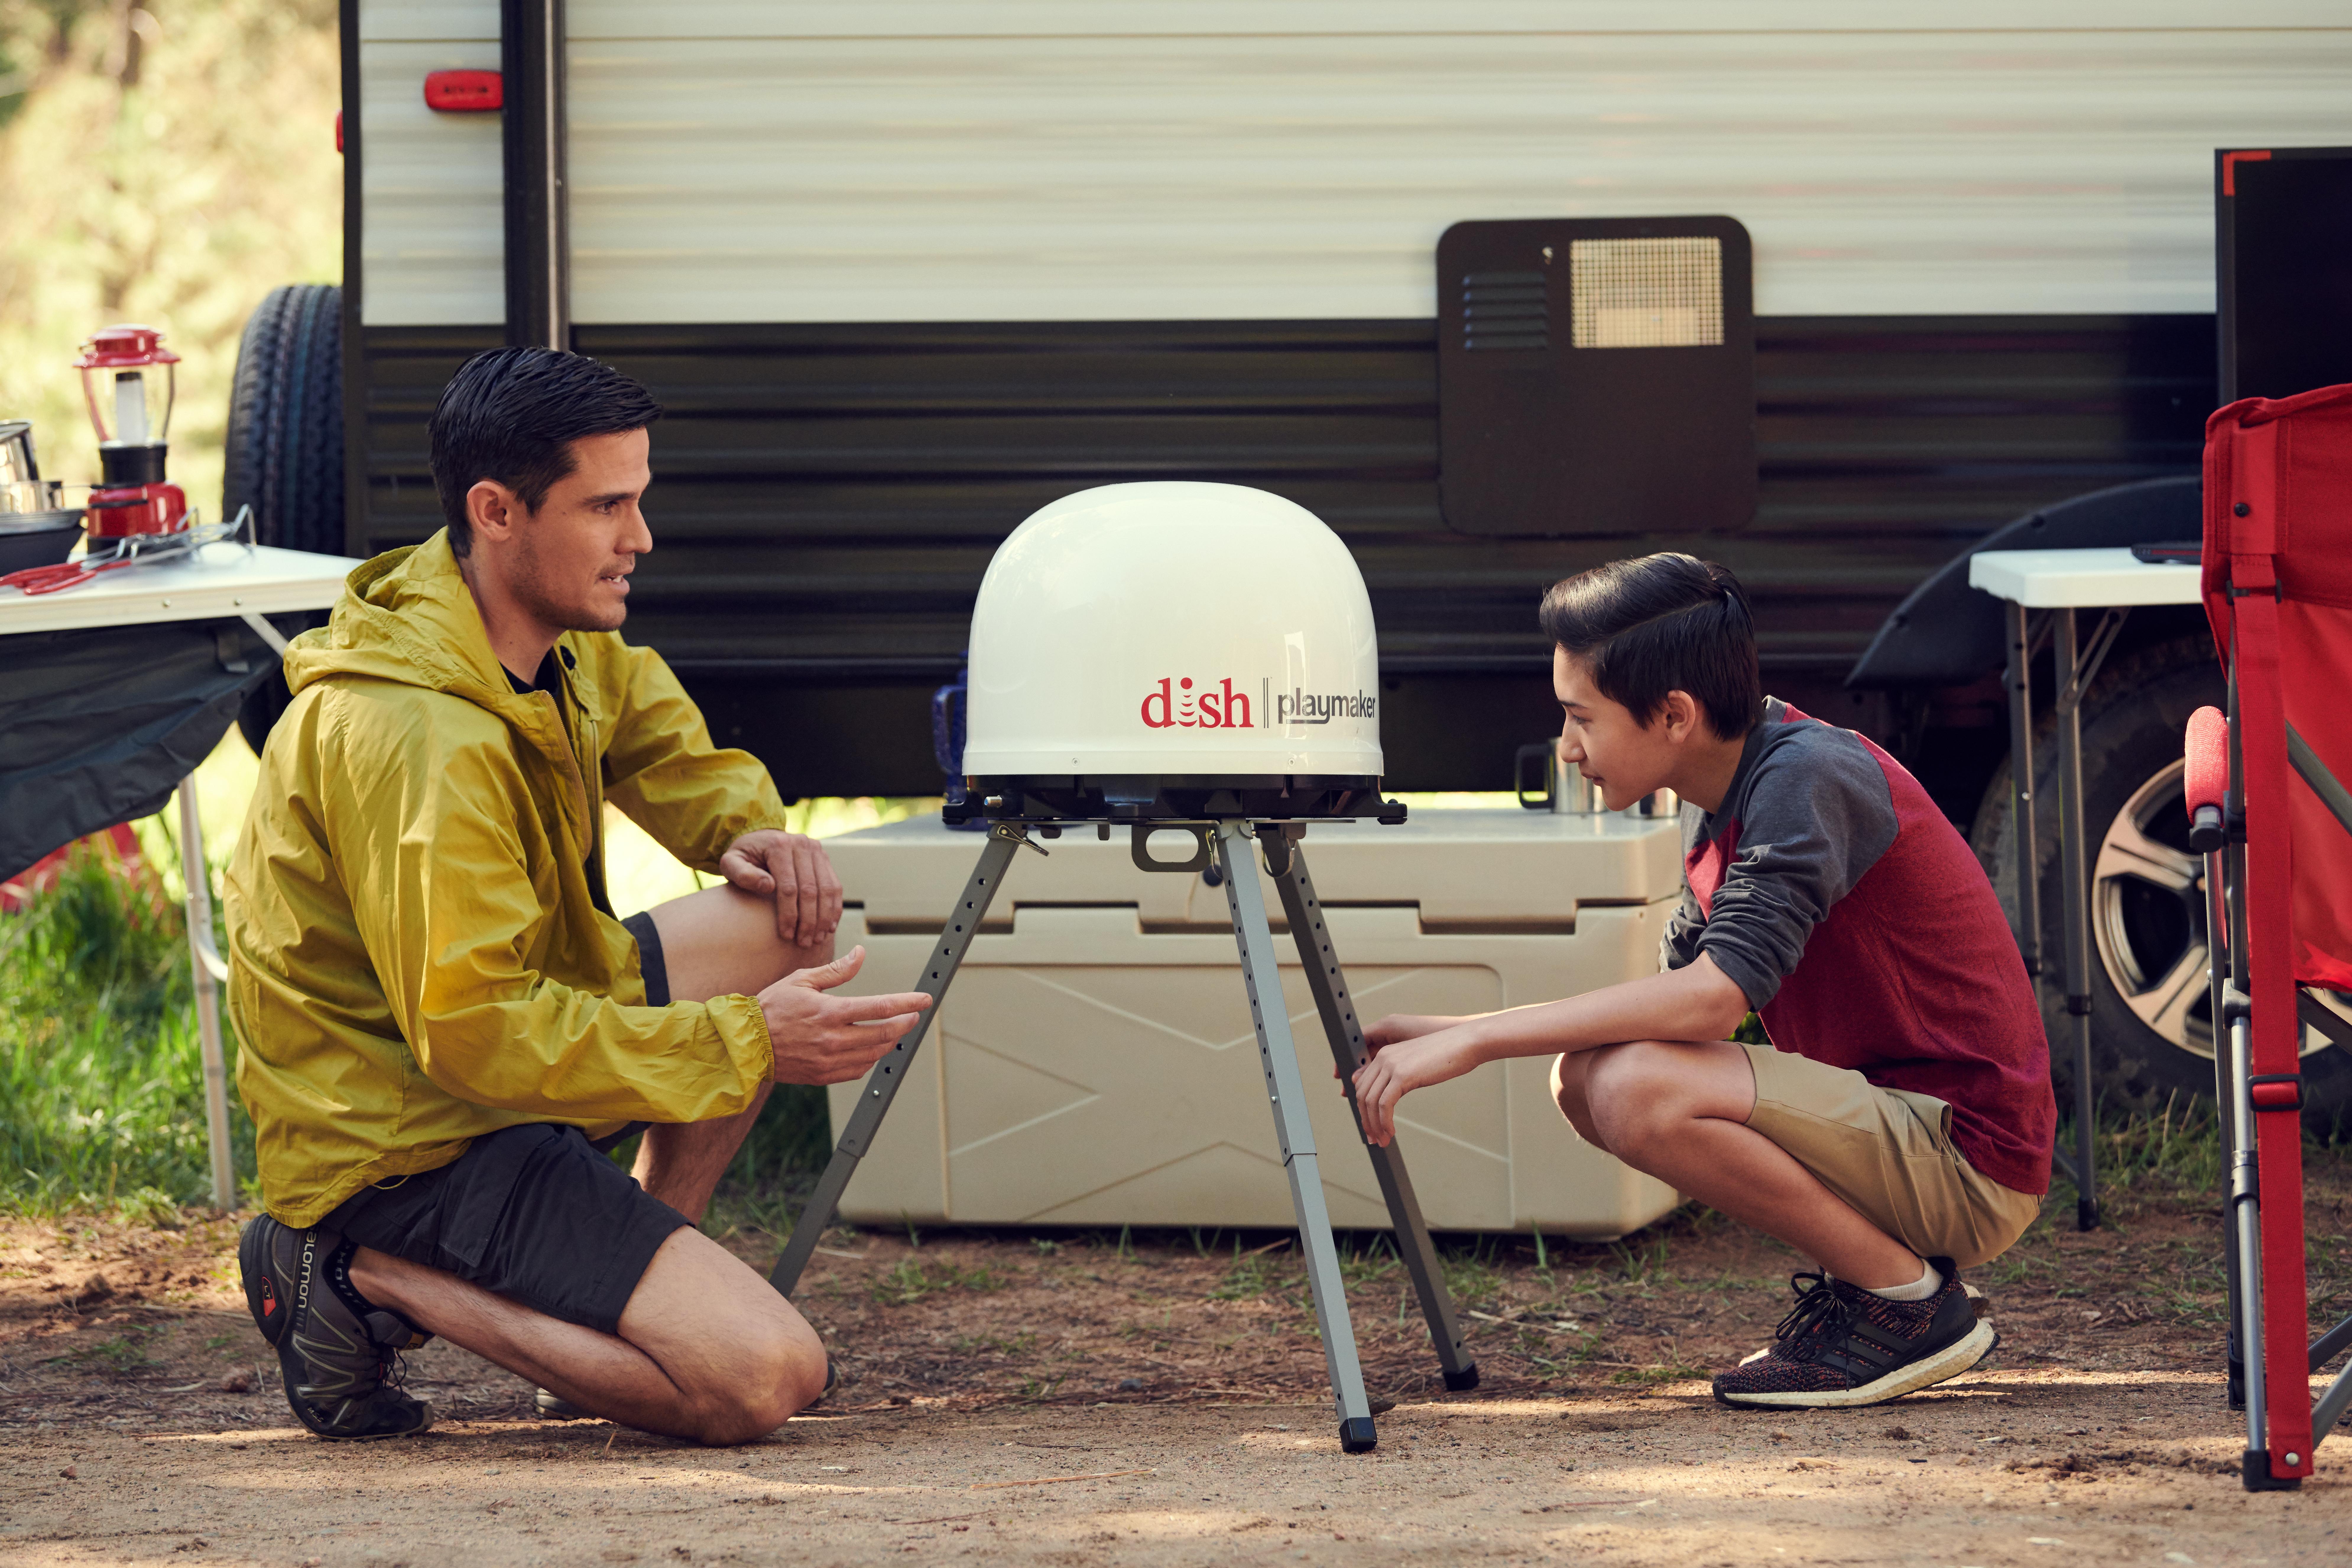 180516_dish outdoors_shot 02_118-1